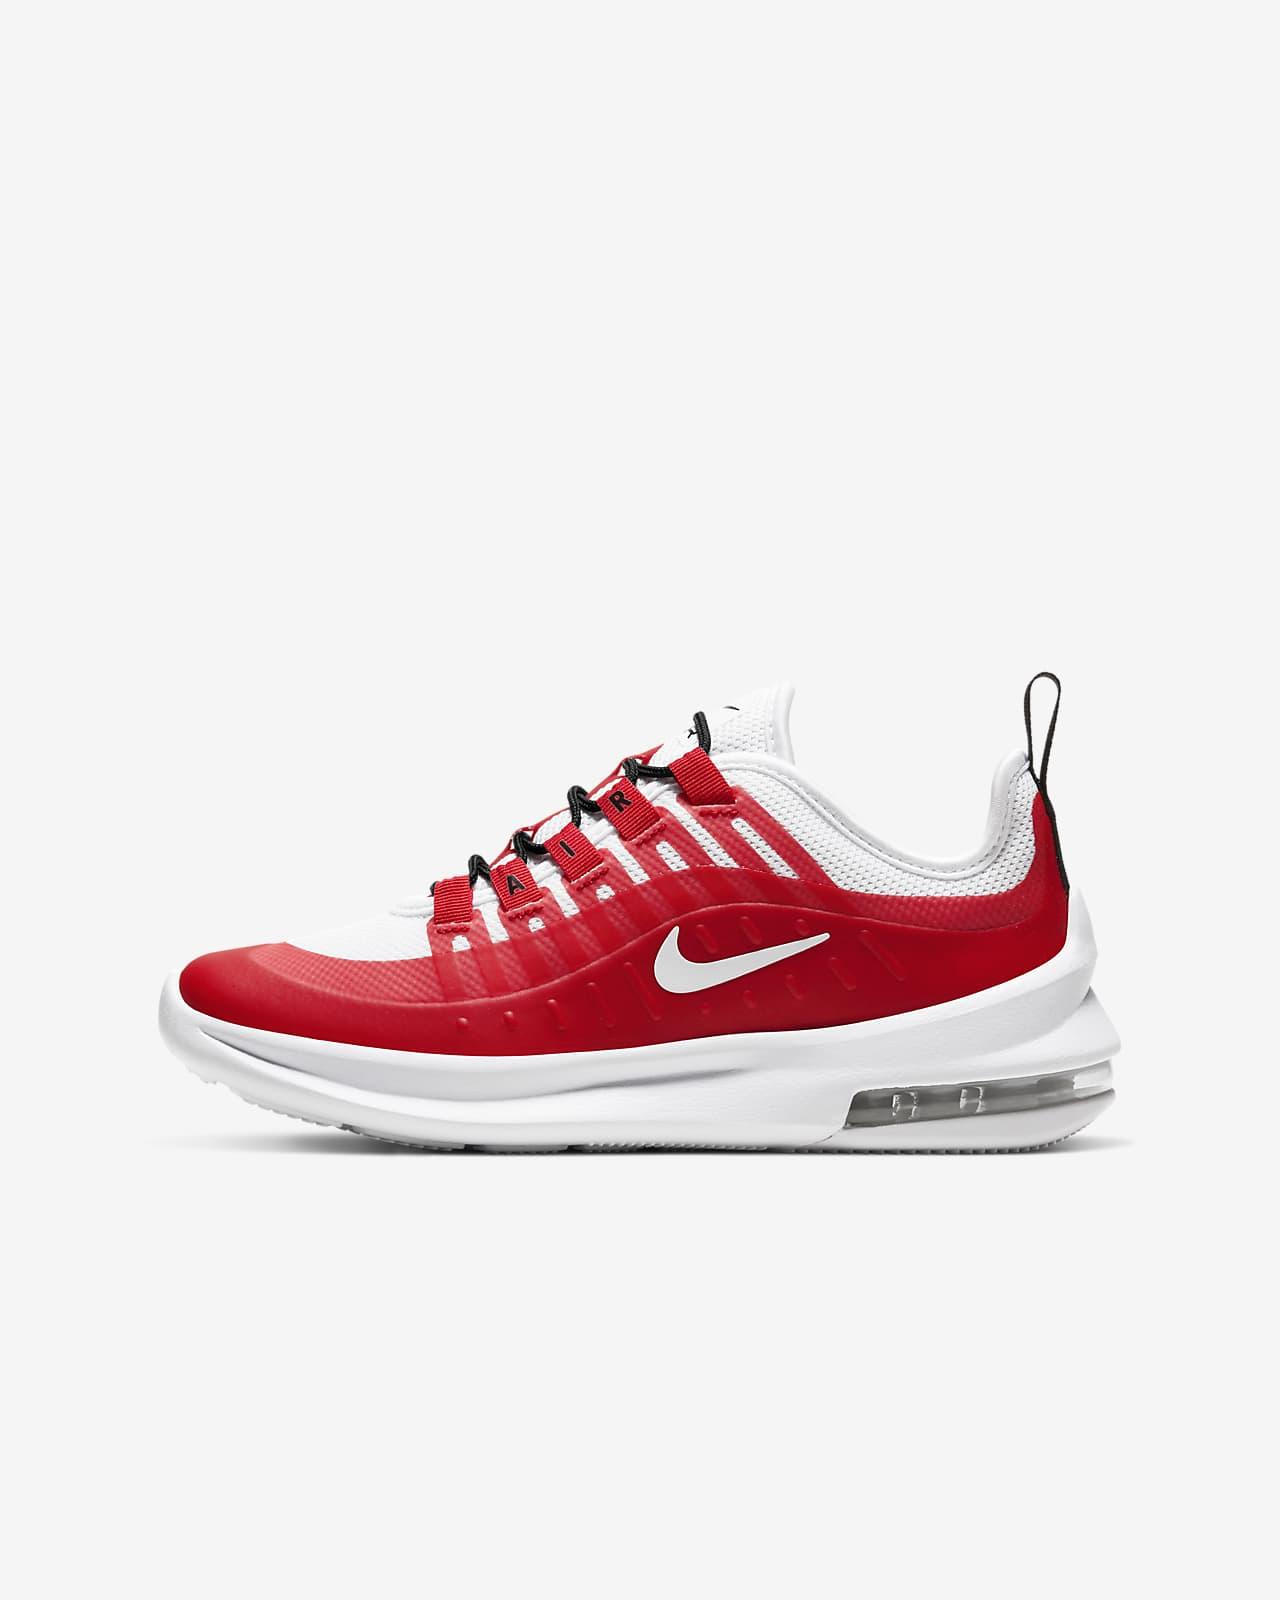 Nike Air Max Axis Older Kids' Shoe. Nike LU